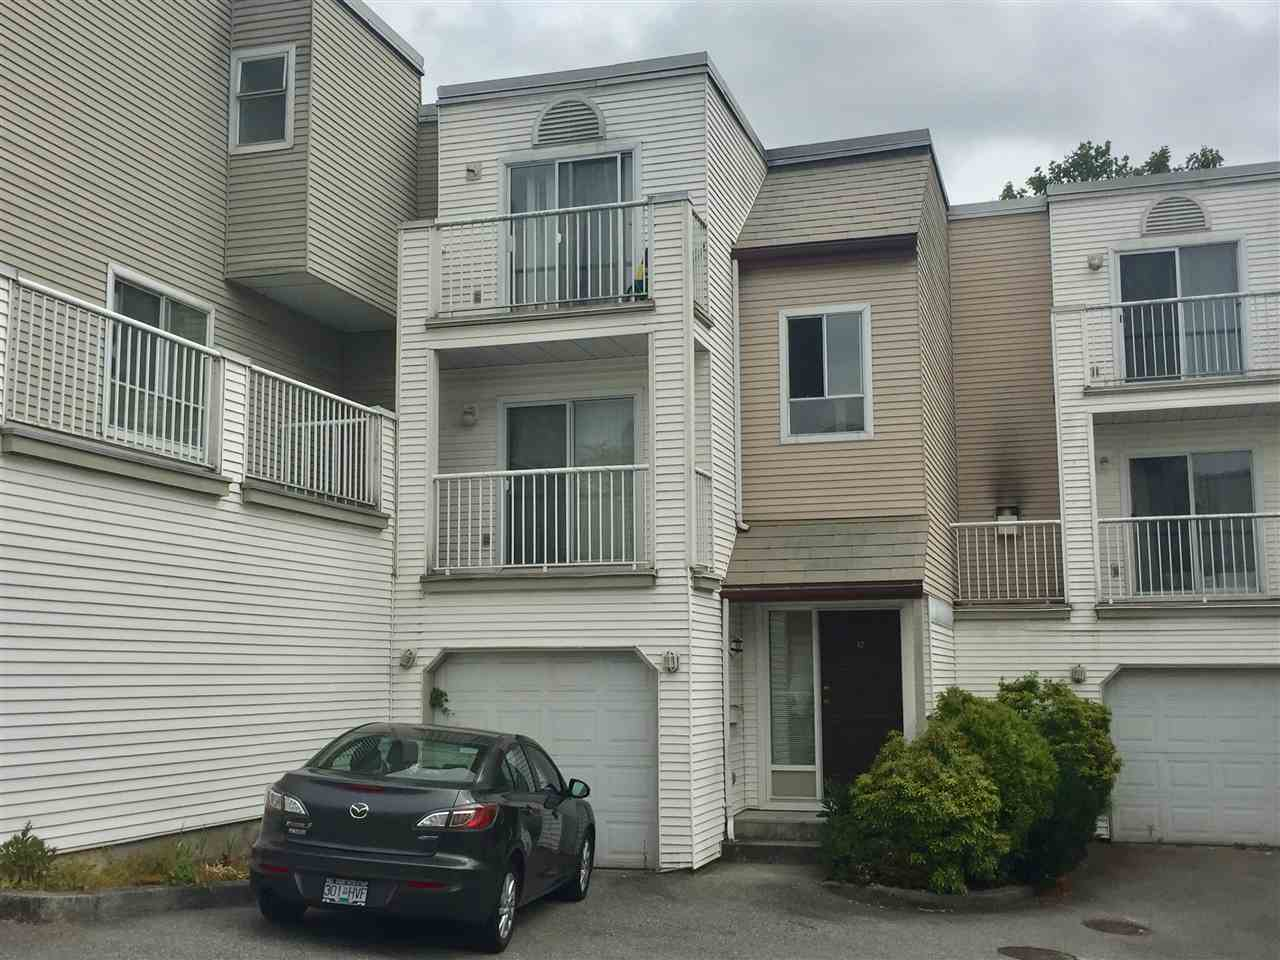 1850 HARBOUR STREET 12, Port Coquitlam, BC V3C 1A3